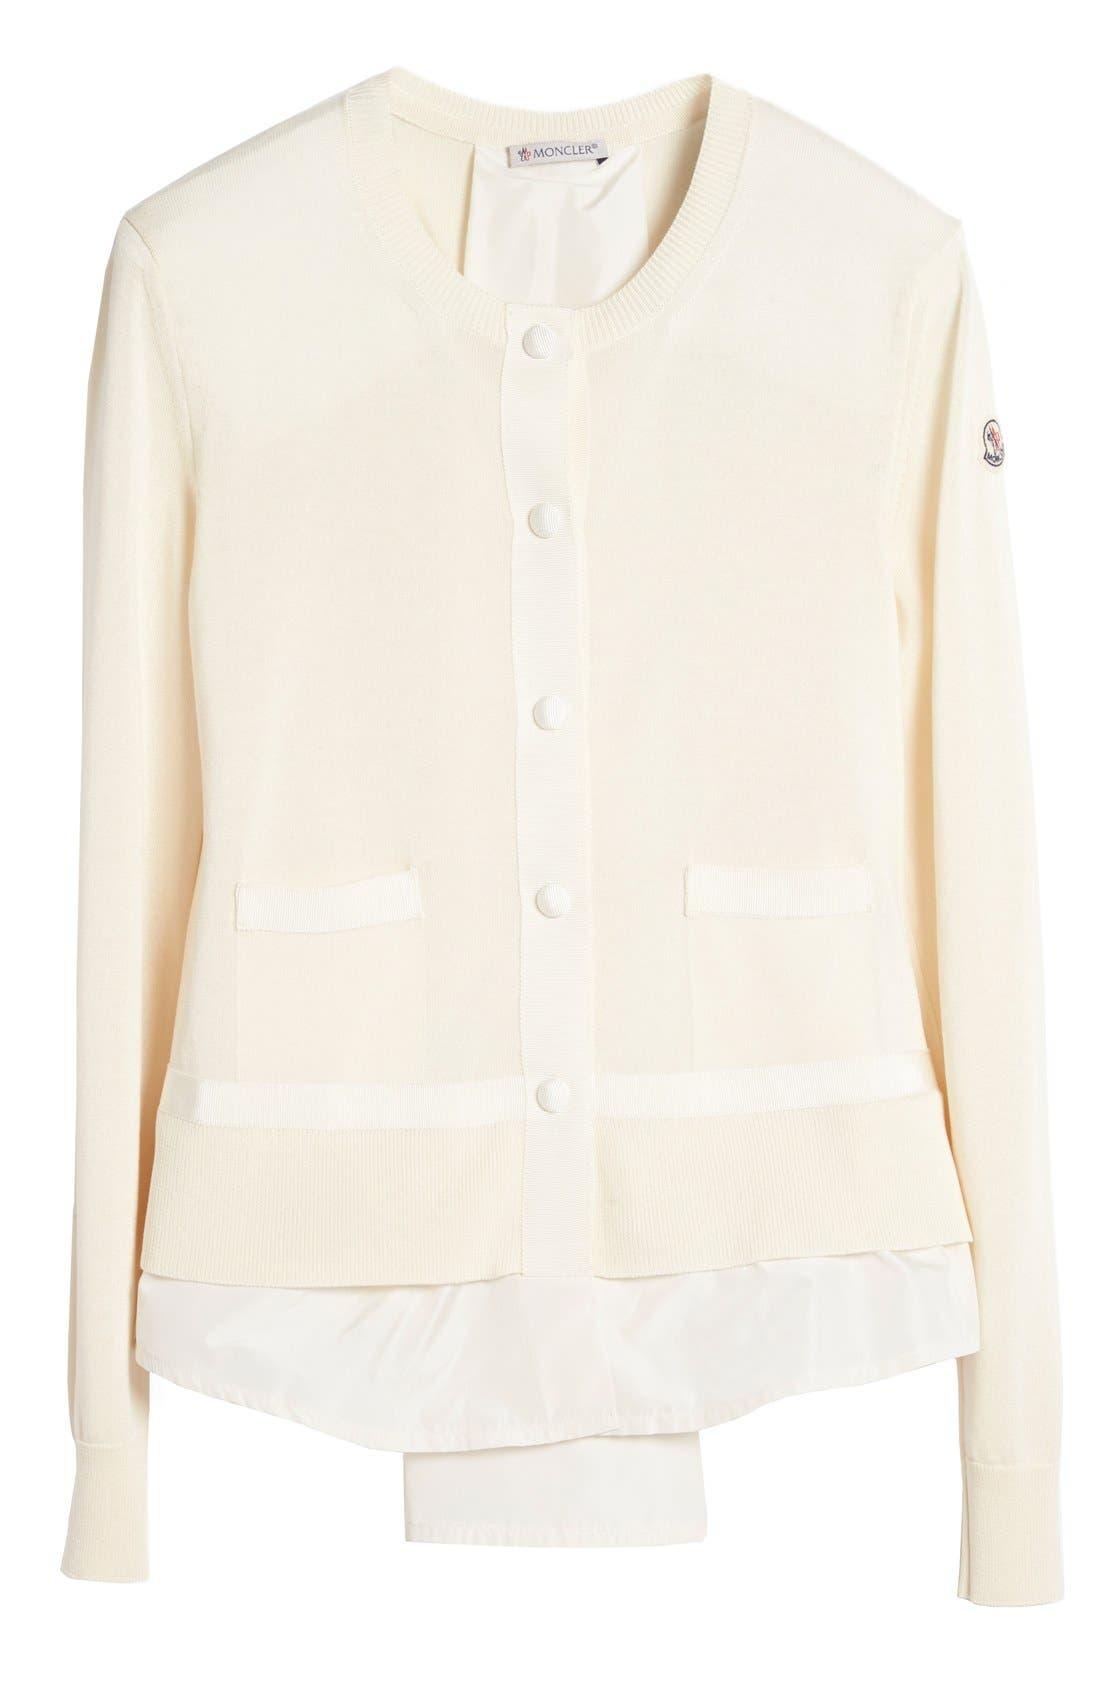 'Maglia' Tricot Button Cardigan,                             Alternate thumbnail 5, color,                             WHITE